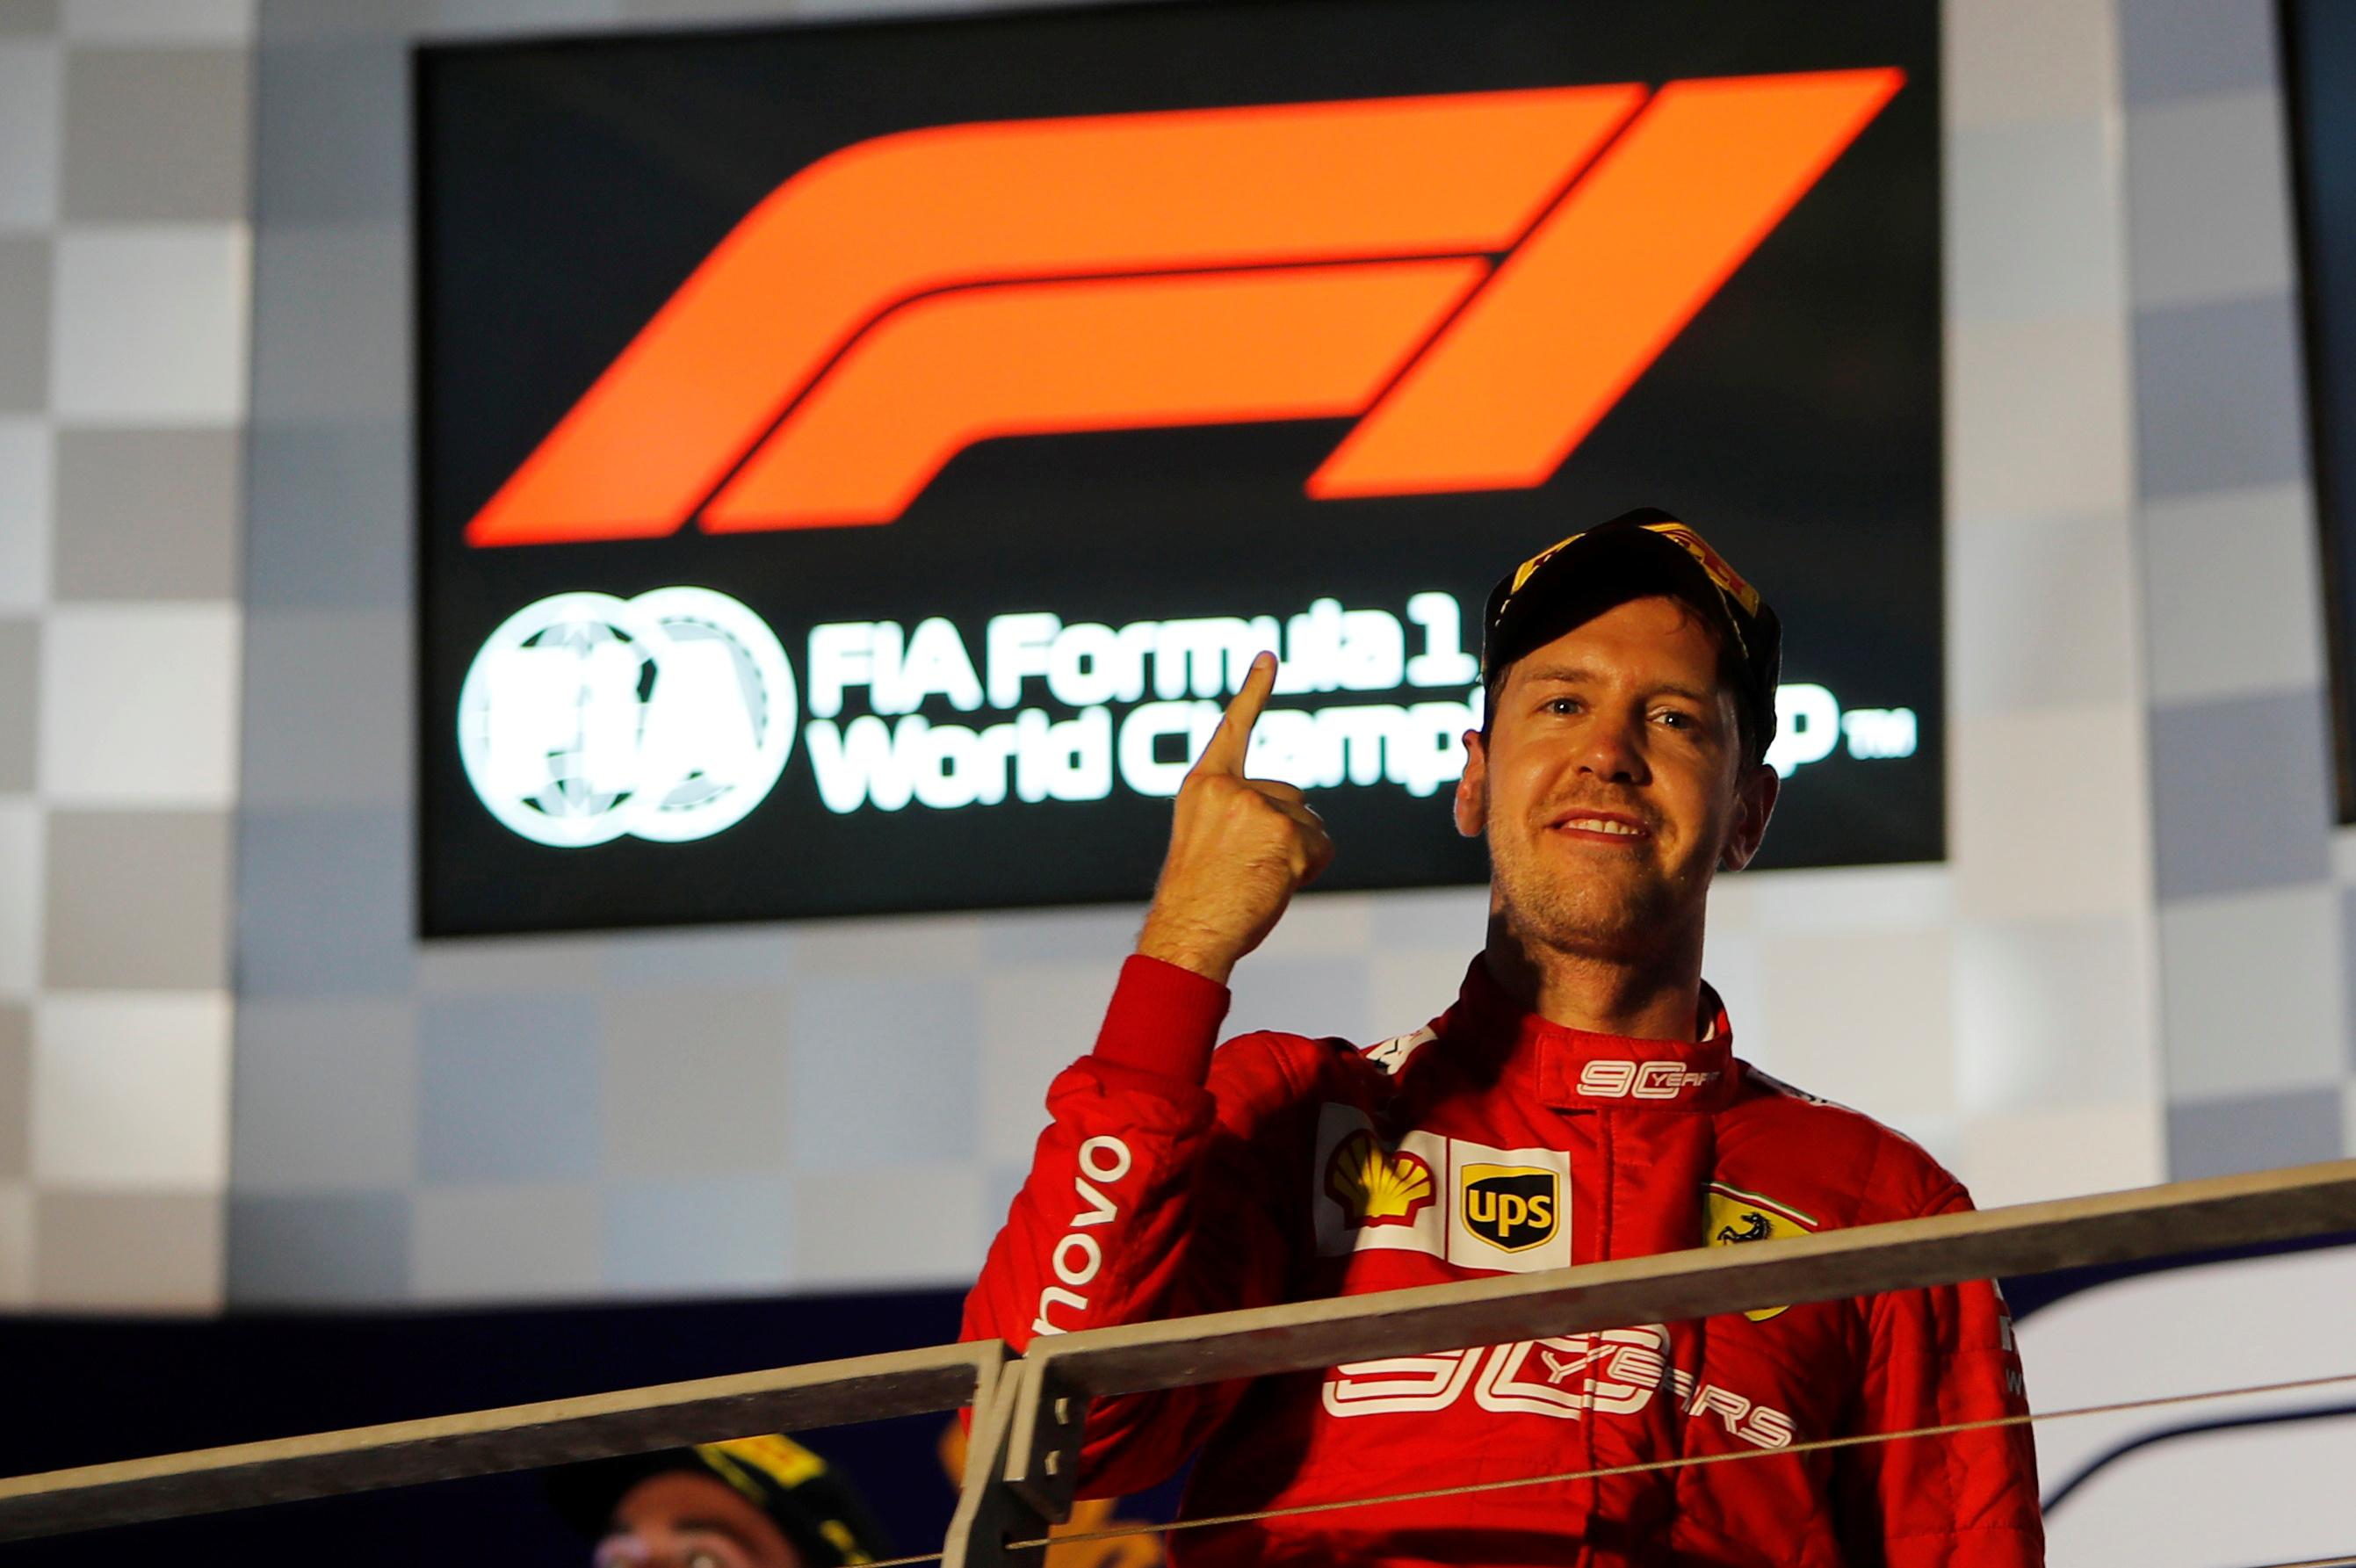 Formula 1: Θρίαμβος για Φέτελ και Ferrari! Εκτός βάθρου η Mercedes